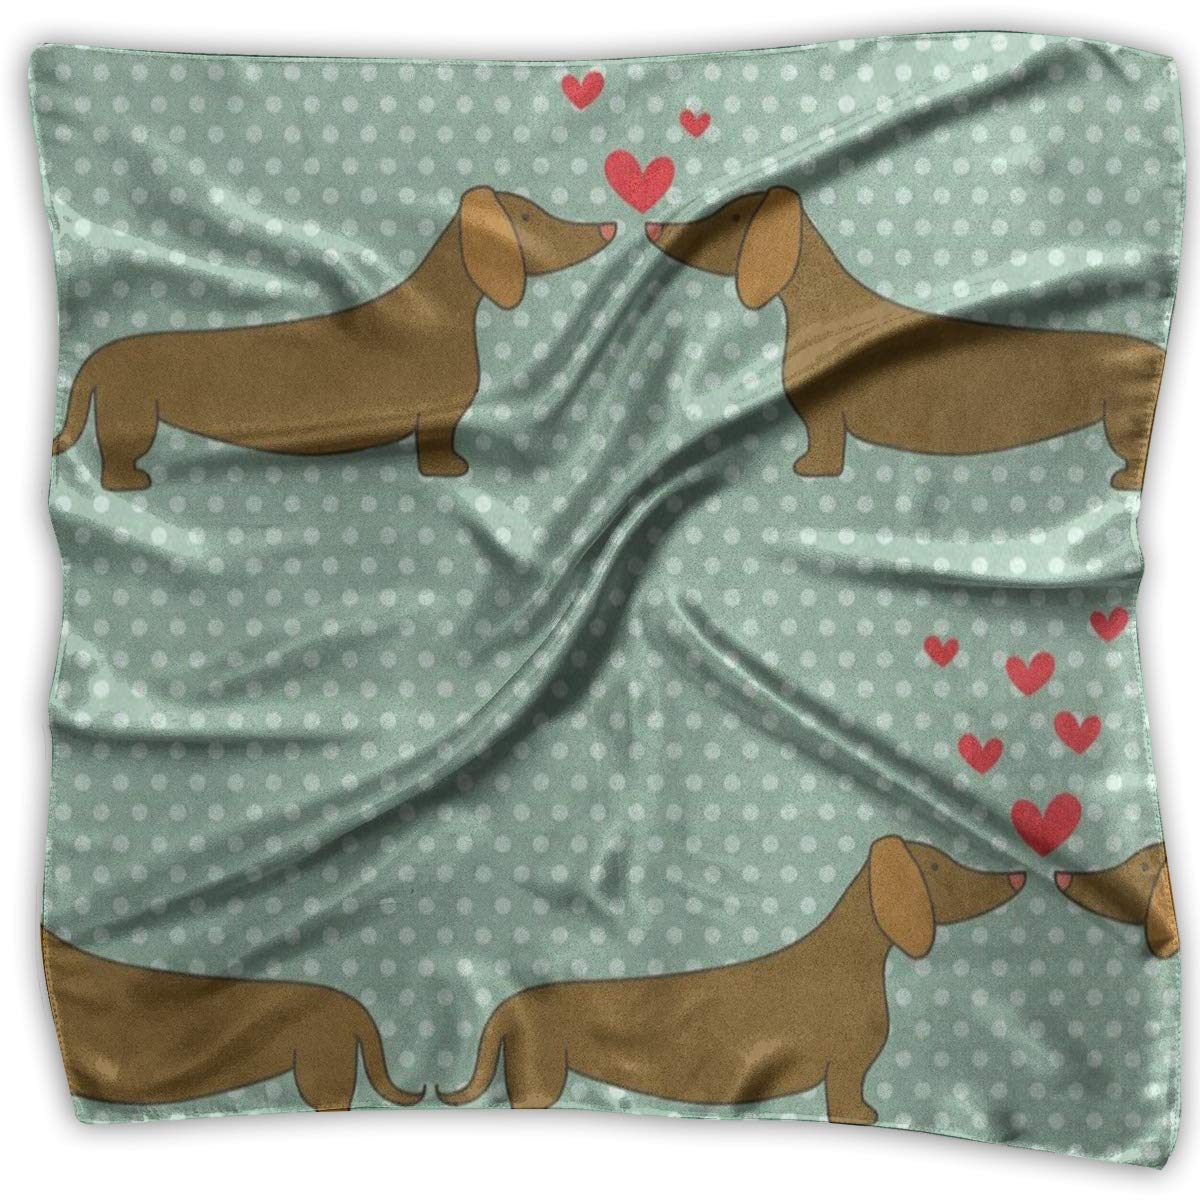 Square Scarf Puppy Dachshund Polka Dot Headband Unisex Muffler Tie For Women